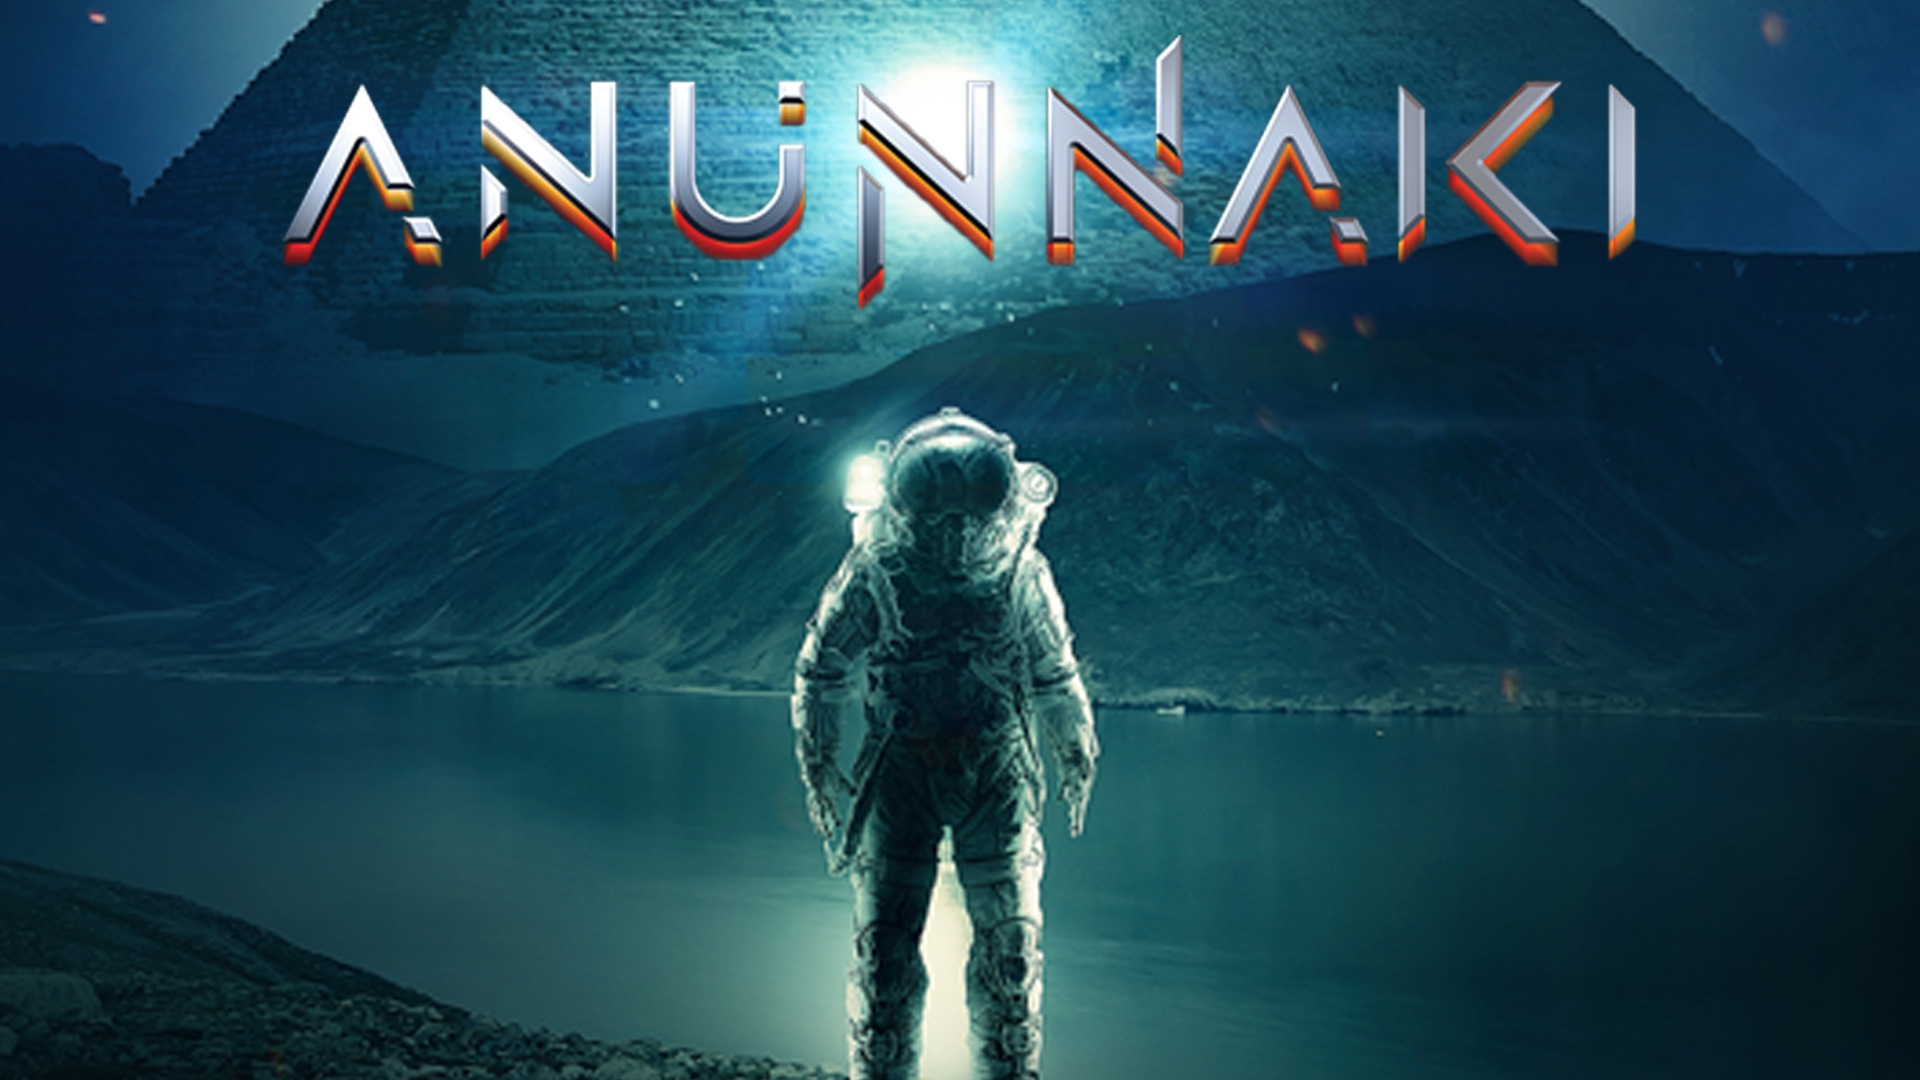 Watch Anunnaki (2017) Online for Free | The Roku Channel | Roku